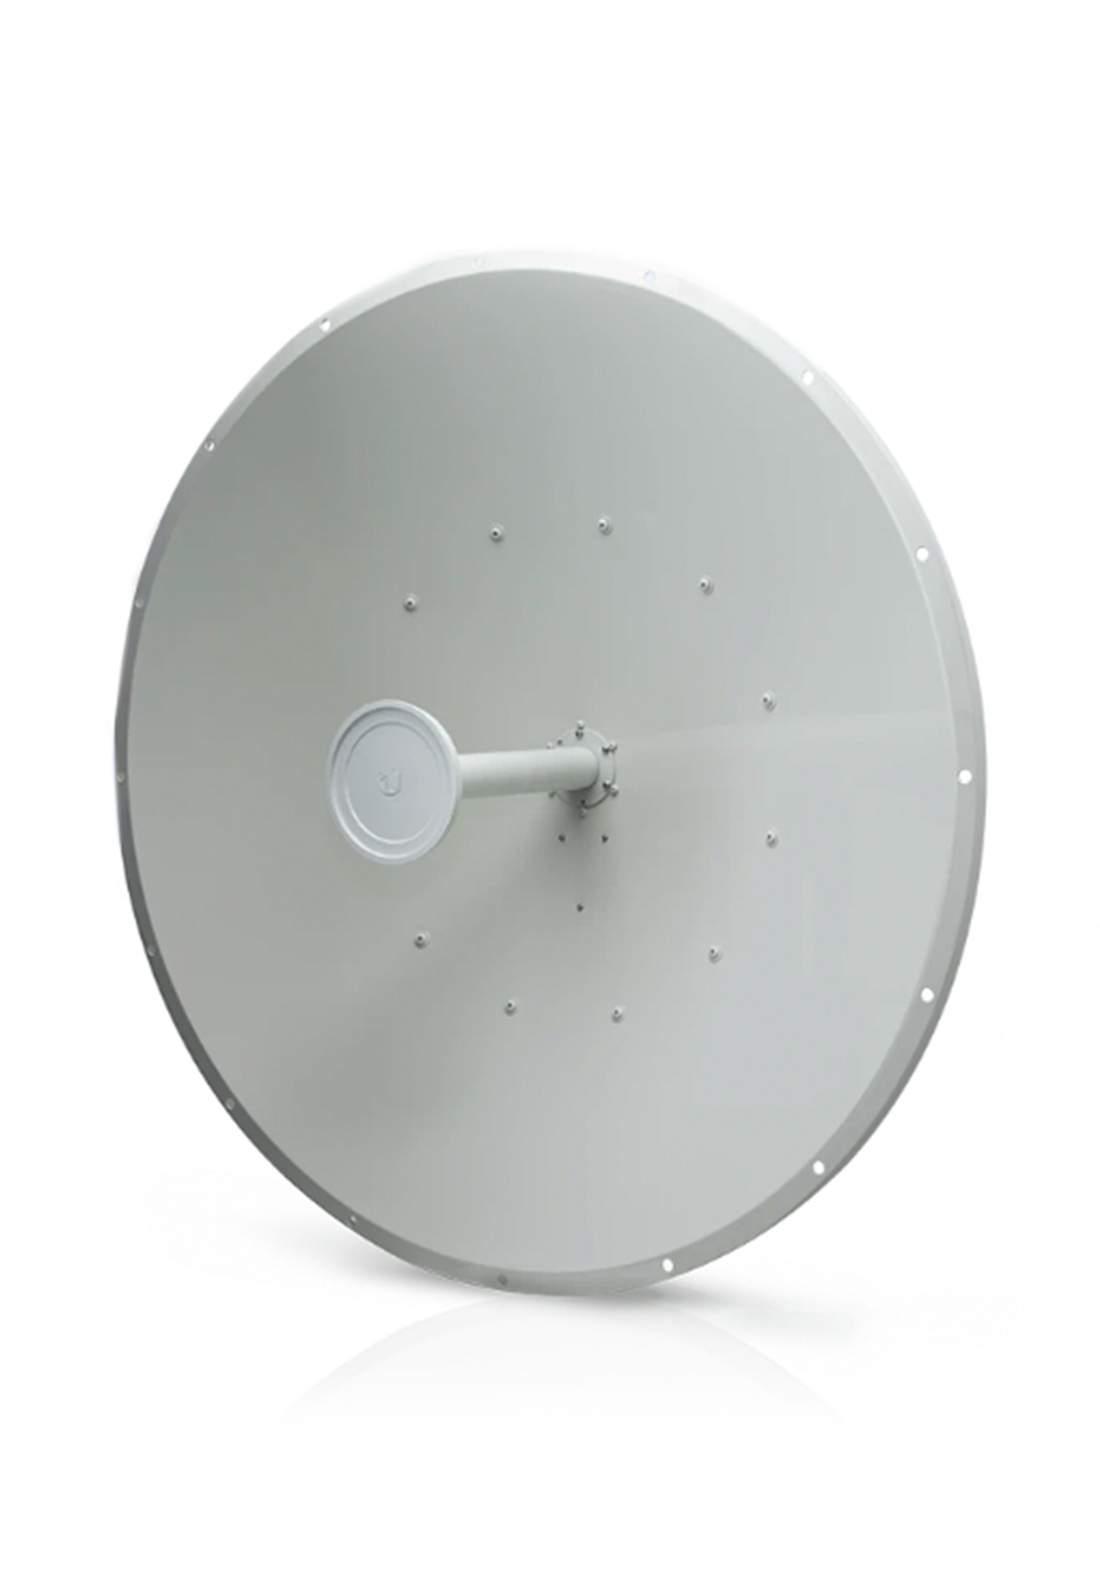 Ubiquiti Networks RD-5G34 Bridge Dish Antenna - White